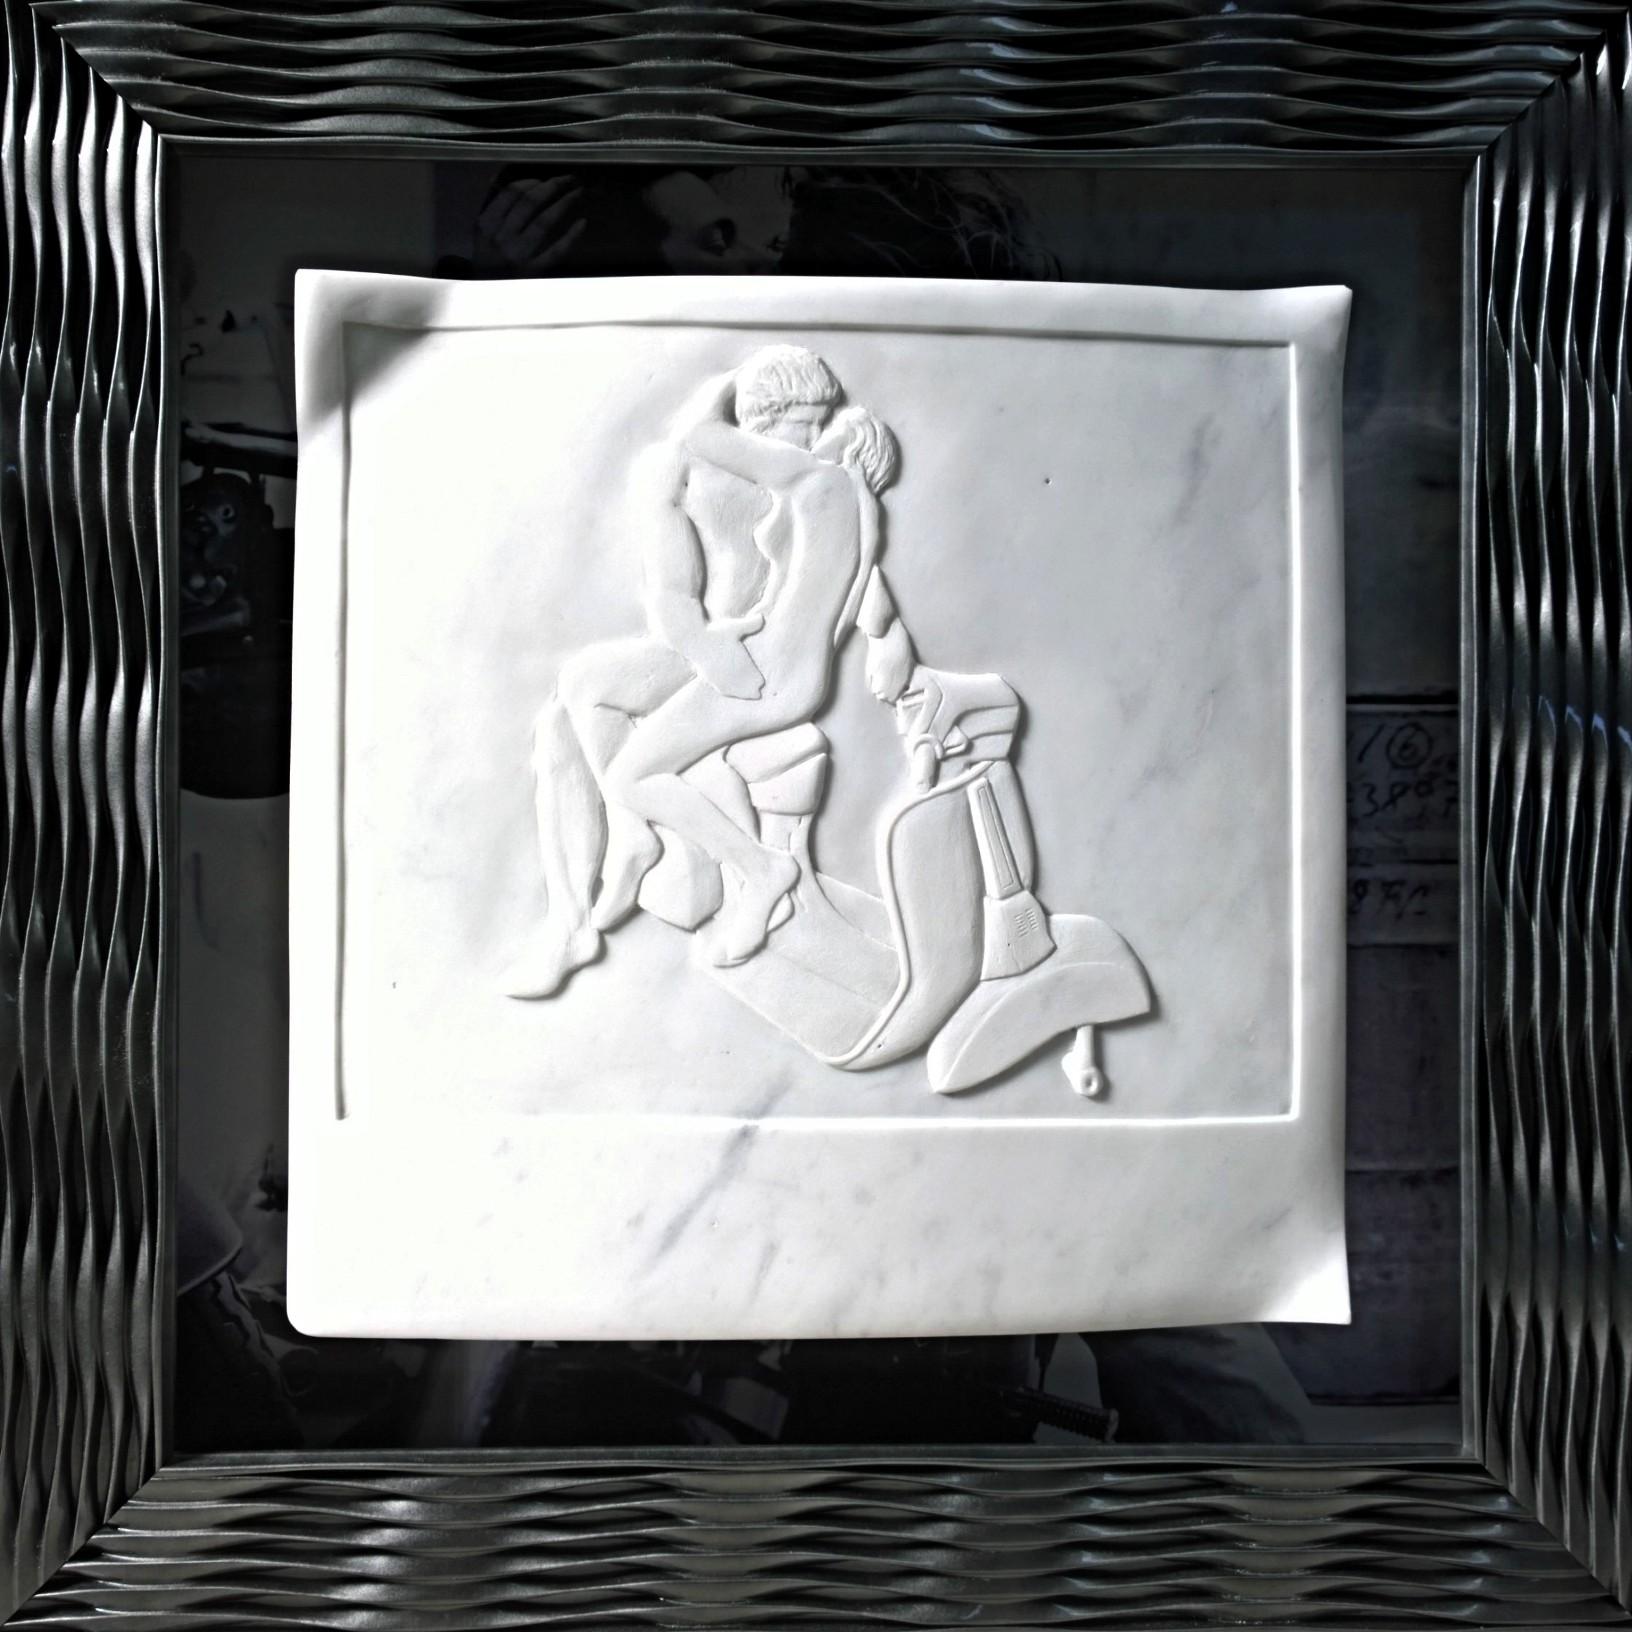 Nazareno Biondo lovers vespa marble on frame, 61x61x8cm, 2017